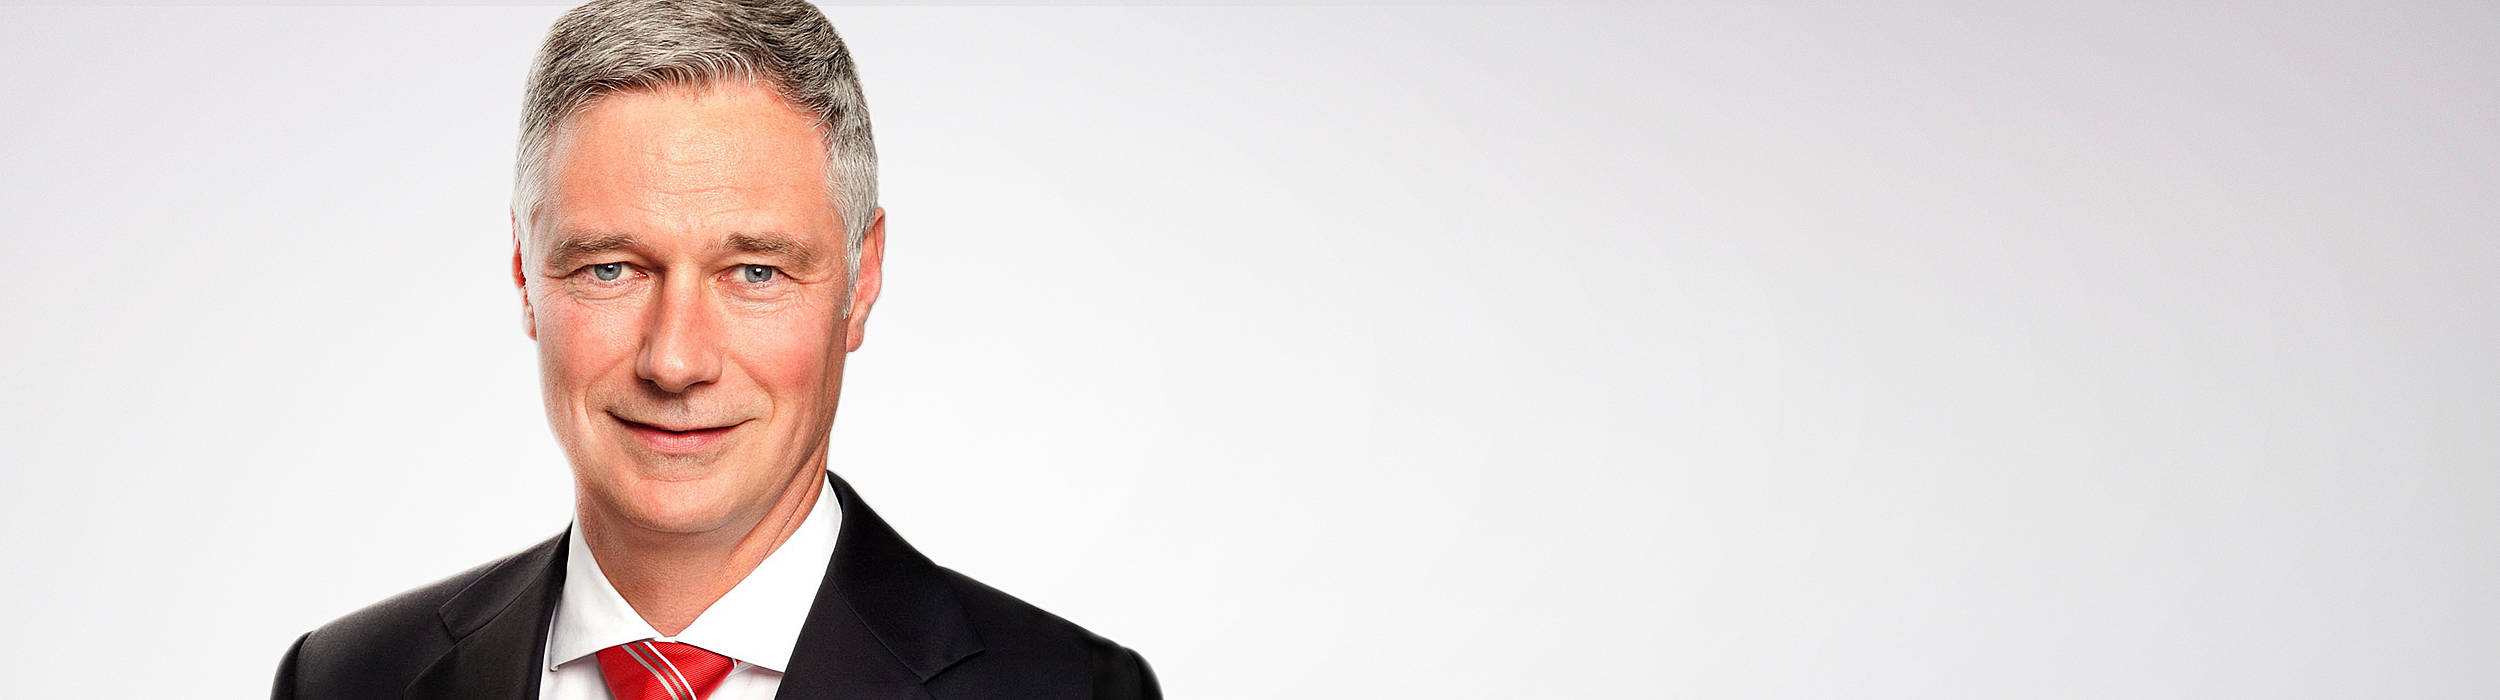 Матијас Фишер, Извршен директор и Претседател на Toyota Material Handling Europe